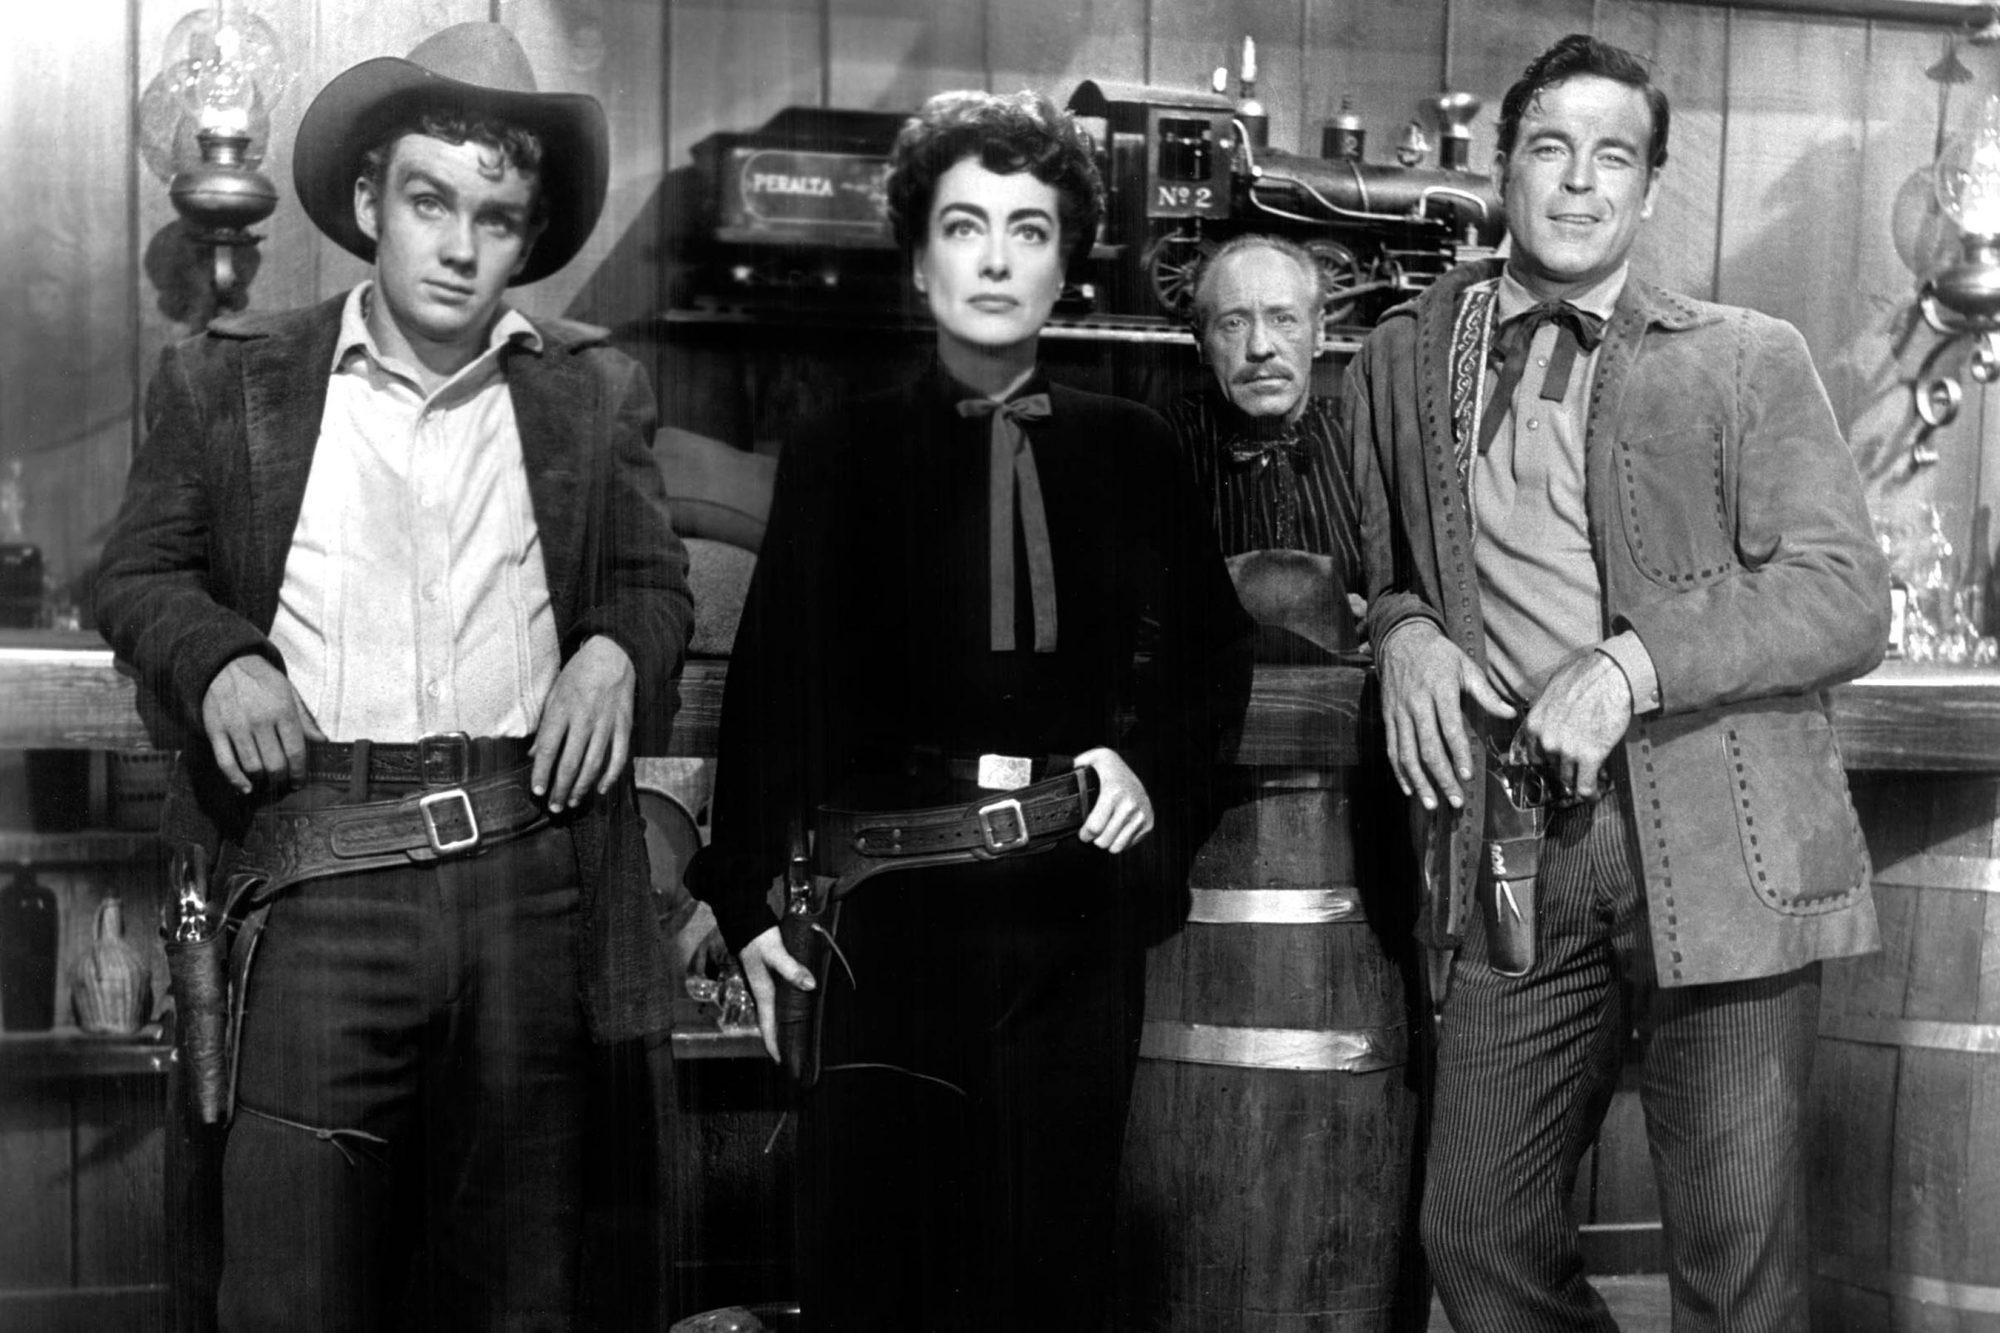 JOHNNY GUITAR, Ben Cooper, Joan Crawford, Frank Ferguson, Scott Brady, 1954